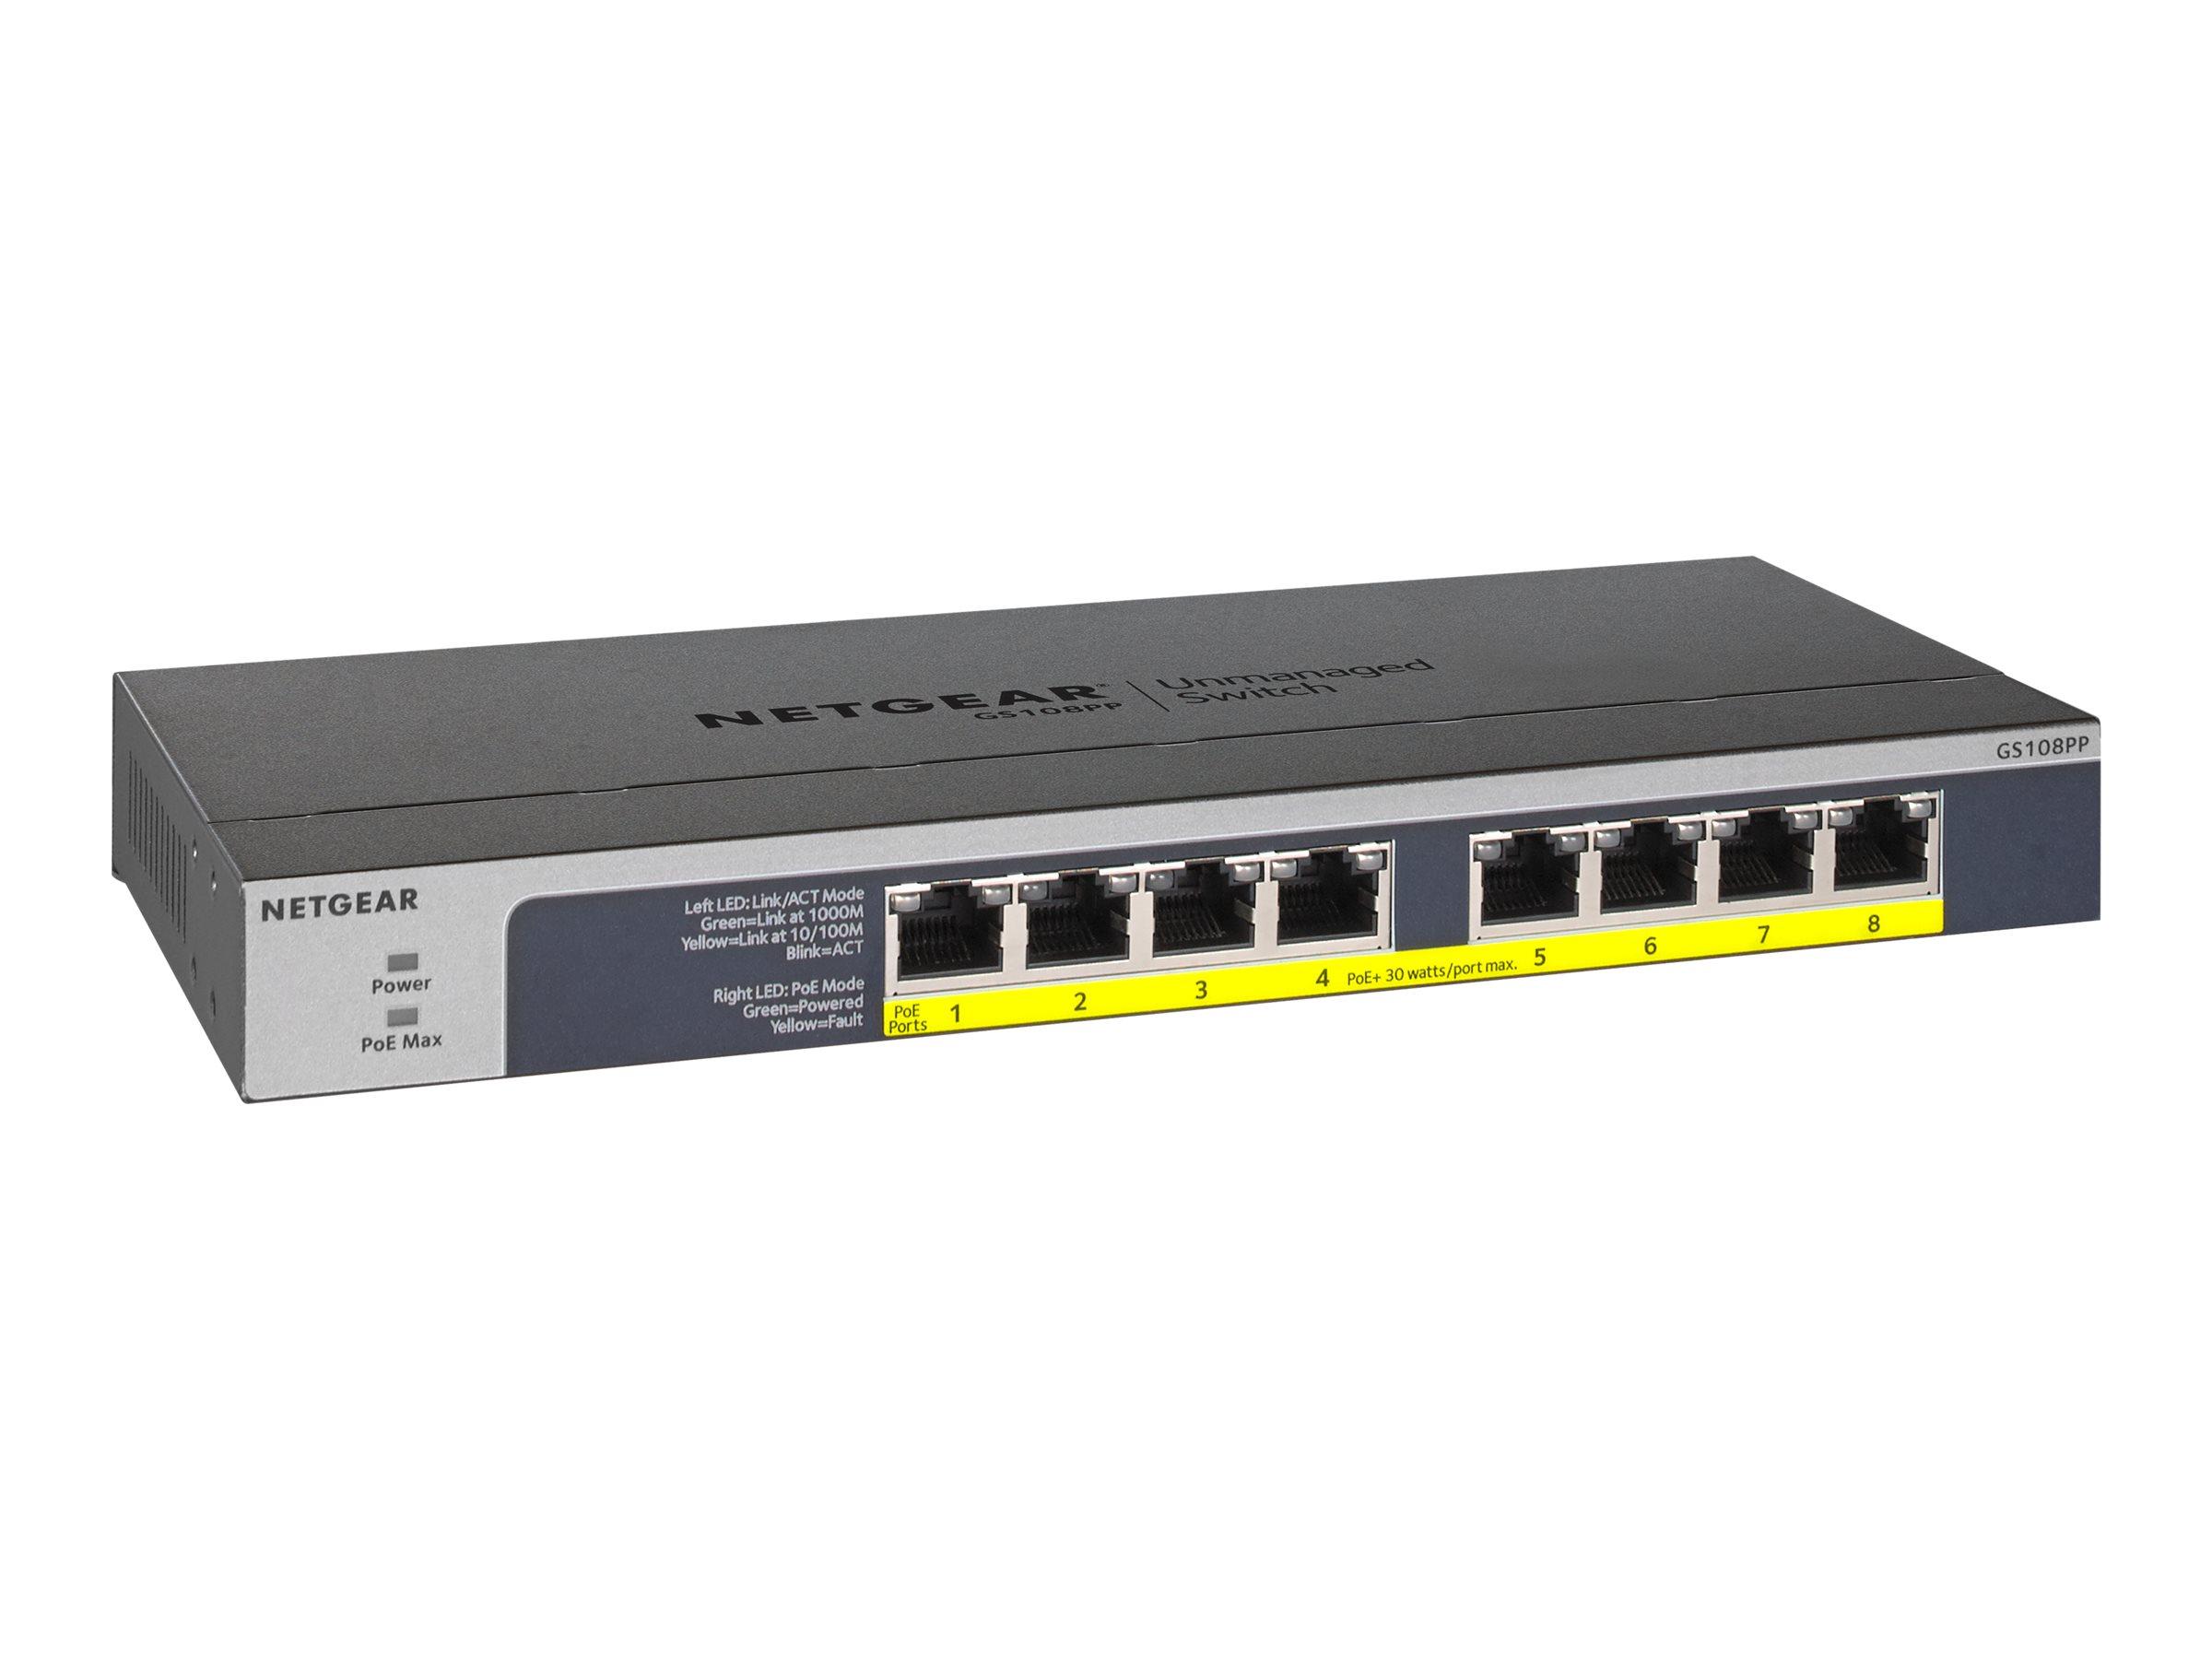 NETGEAR GS108PP - switch - 8 ports - rack-mountable